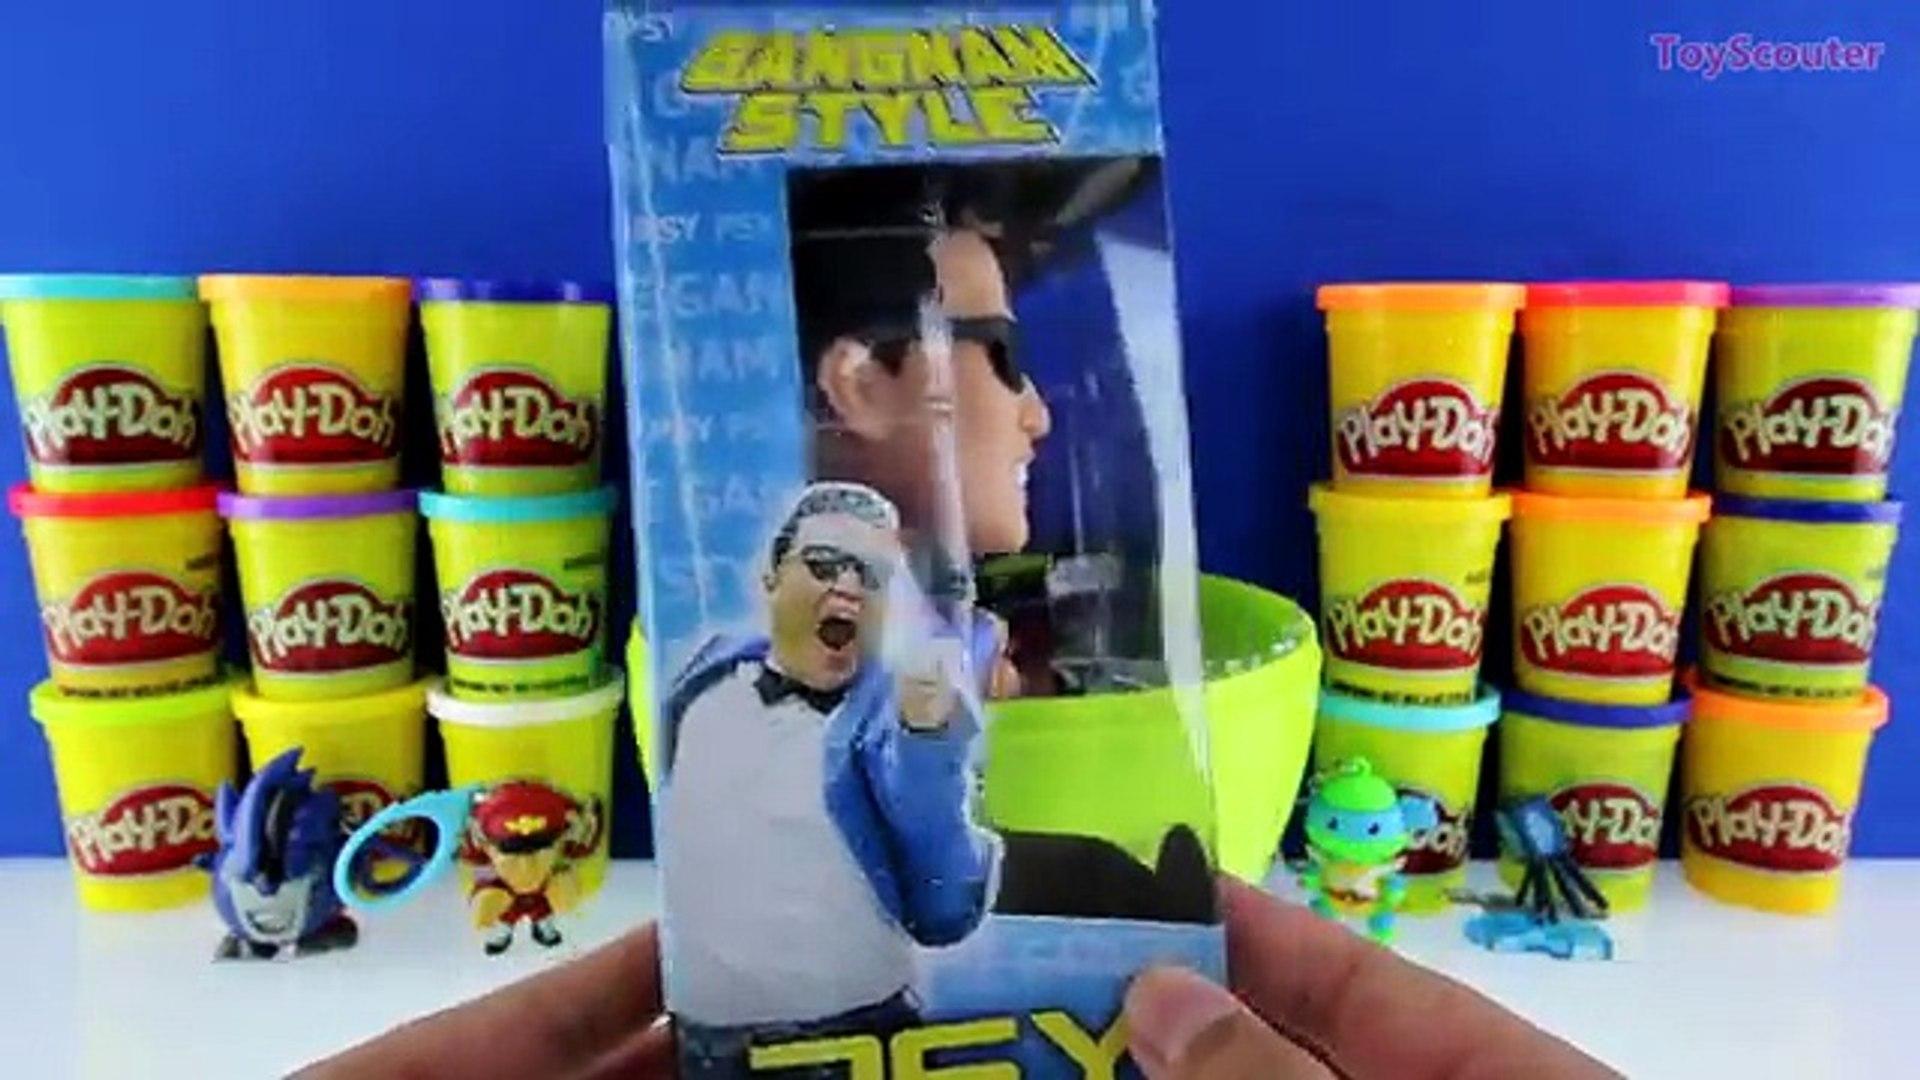 GIANT PSY Surprise Egg Play Doh - Korean Pop Singer Toys Album TMNT Transformers , Cartoons animated